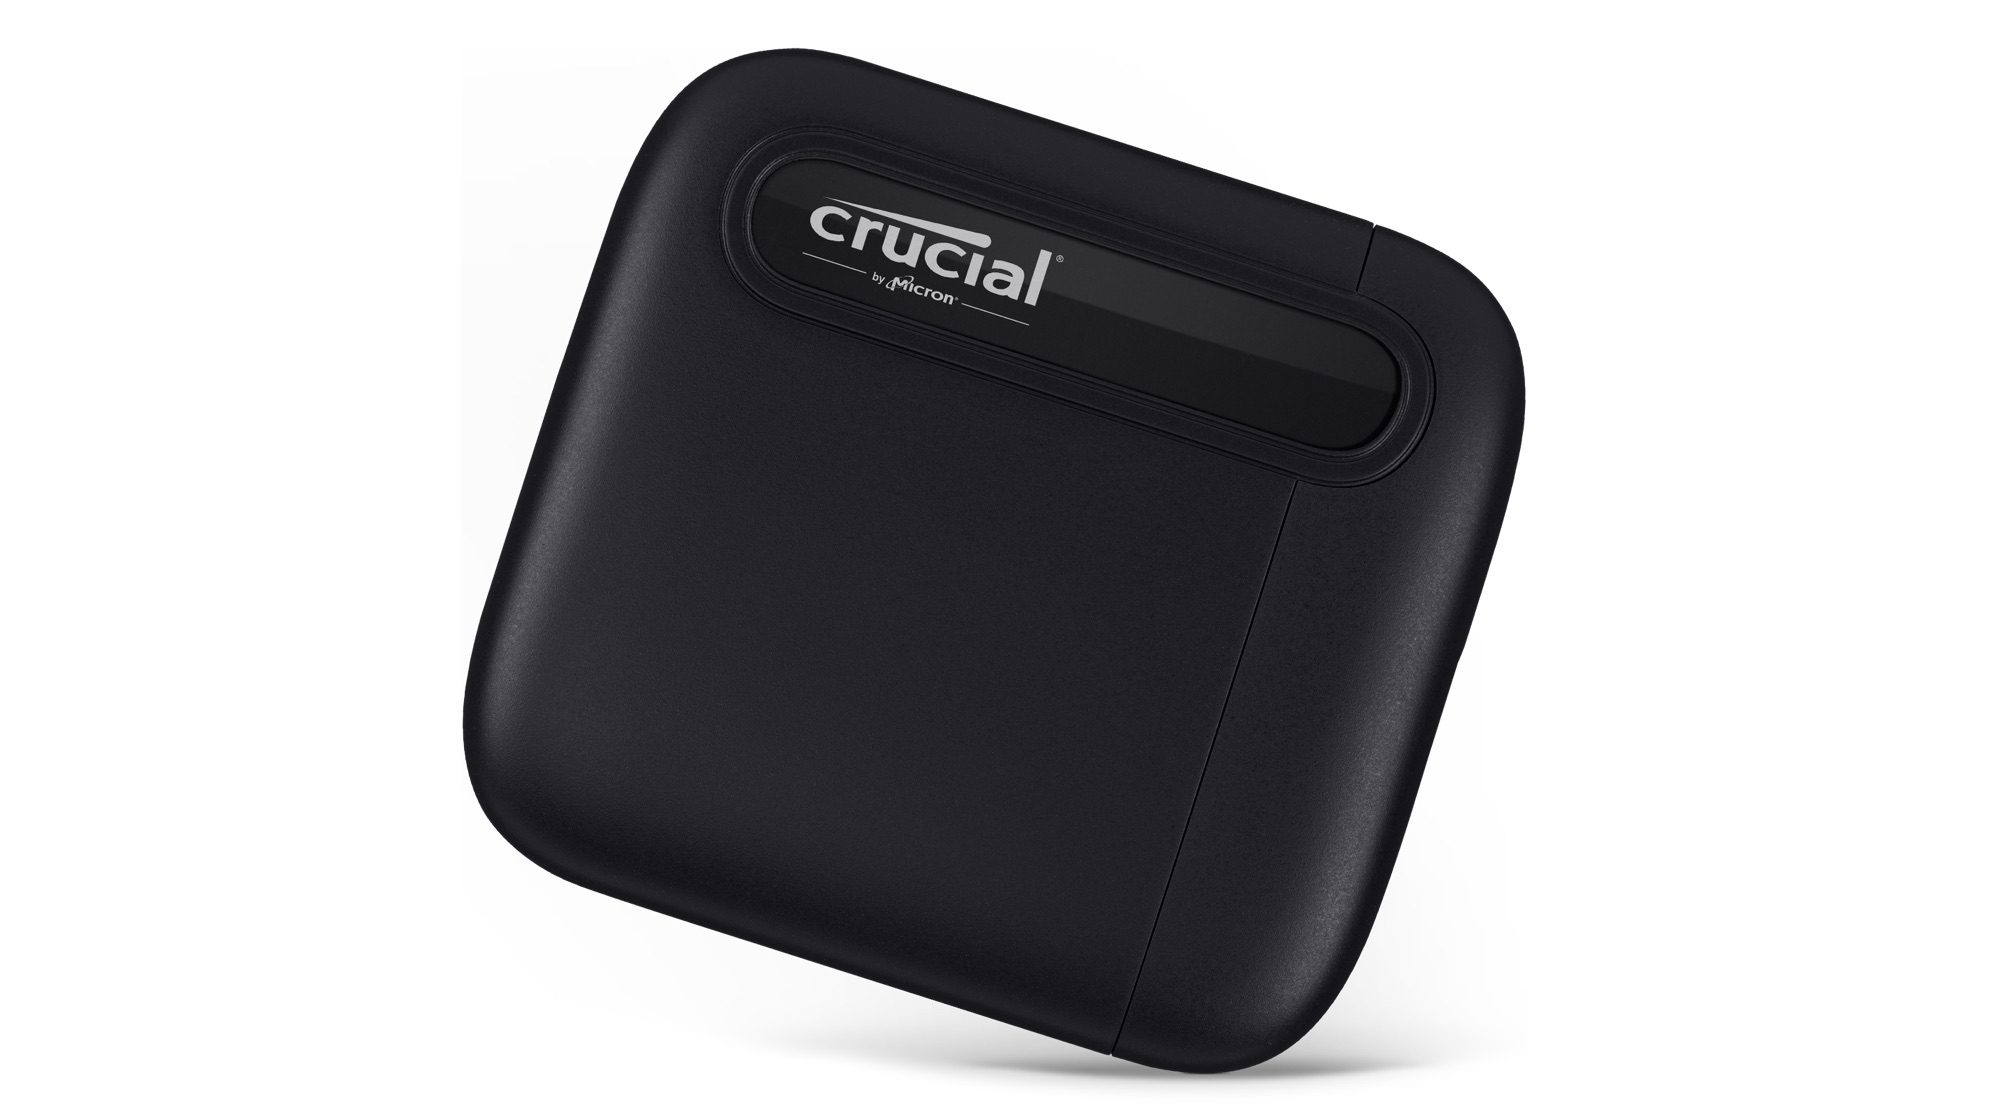 photo of Micron Debuts $490 4TB Crucial X6 External SSD image